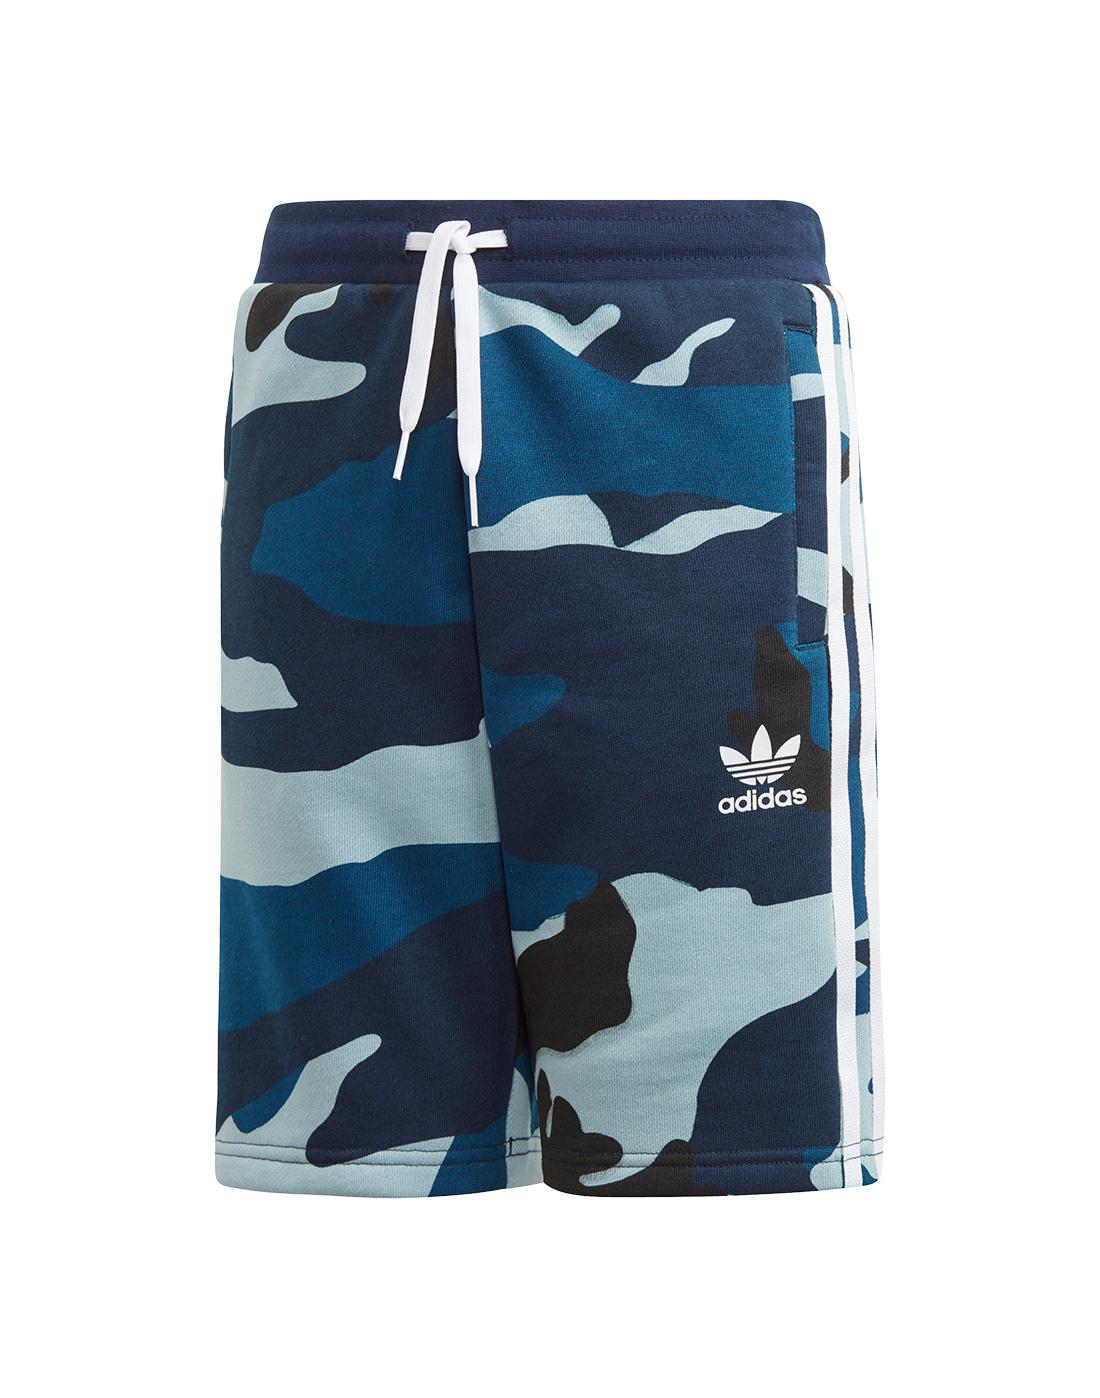 f2d2393362c9c adidas Originals Older Boys Camo Shorts | Life Style Sports